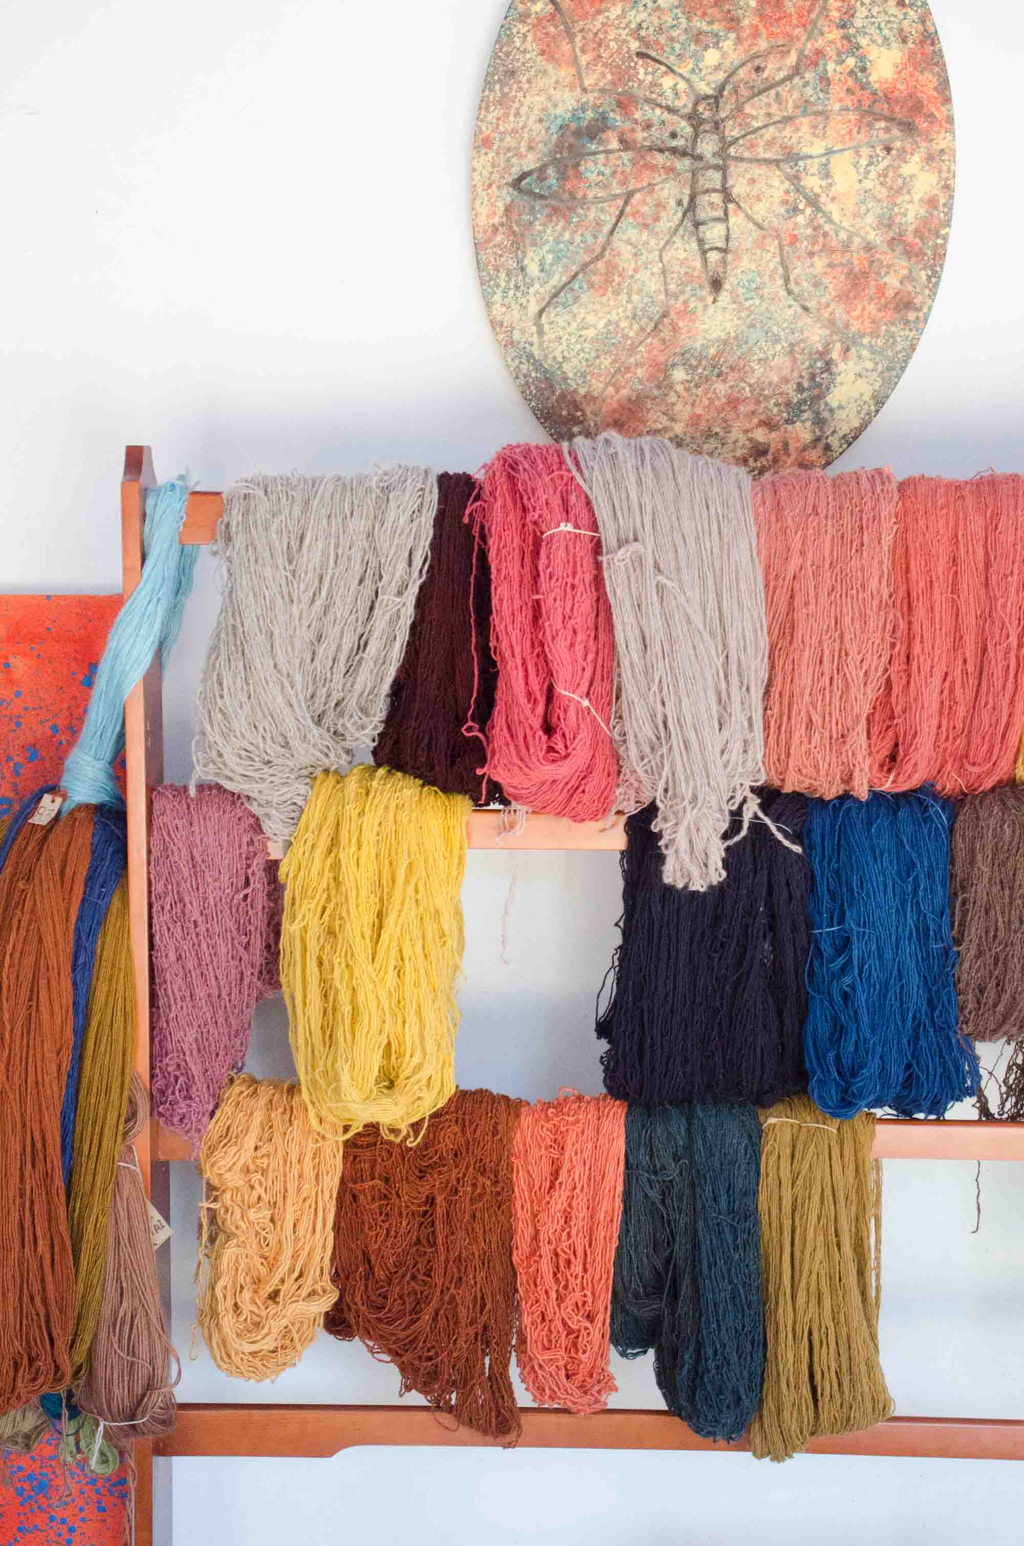 Naturally dyed yarn in Oaxaca, Mexico